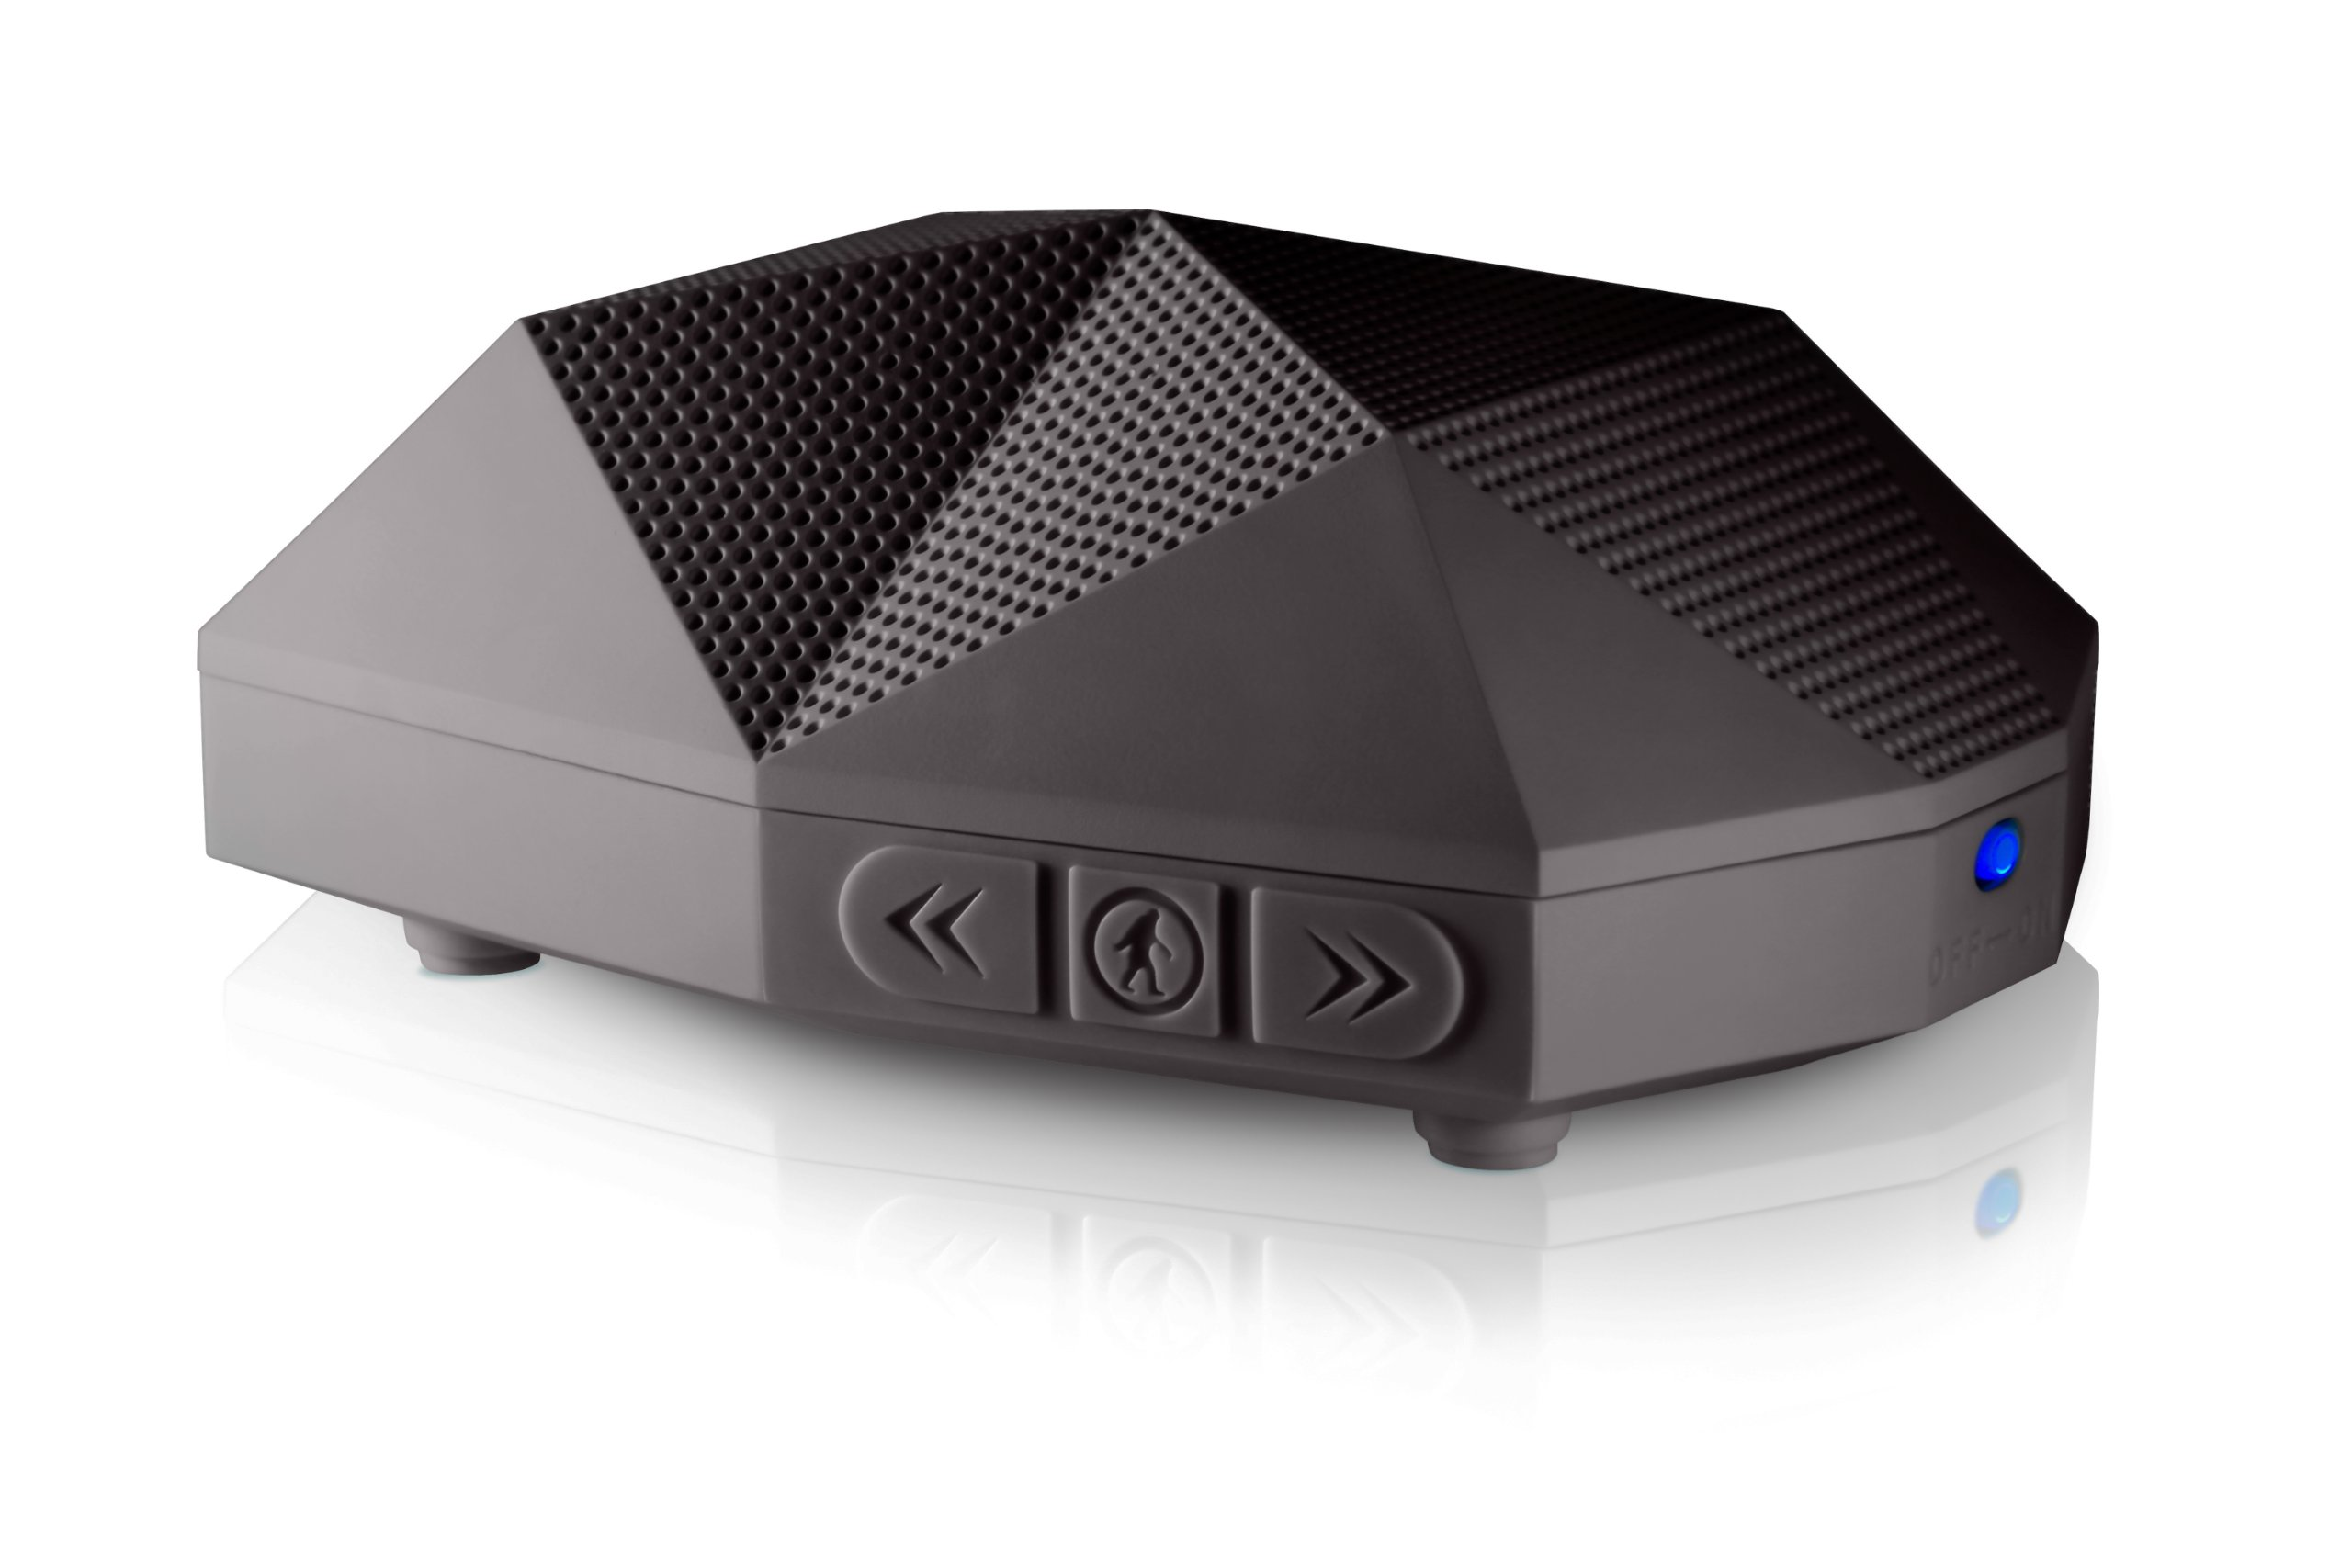 Outdoor Tech Ot1800 Turtle Shell 2.0 - Rugged Water-Resistant Wireless Blueto.. 18